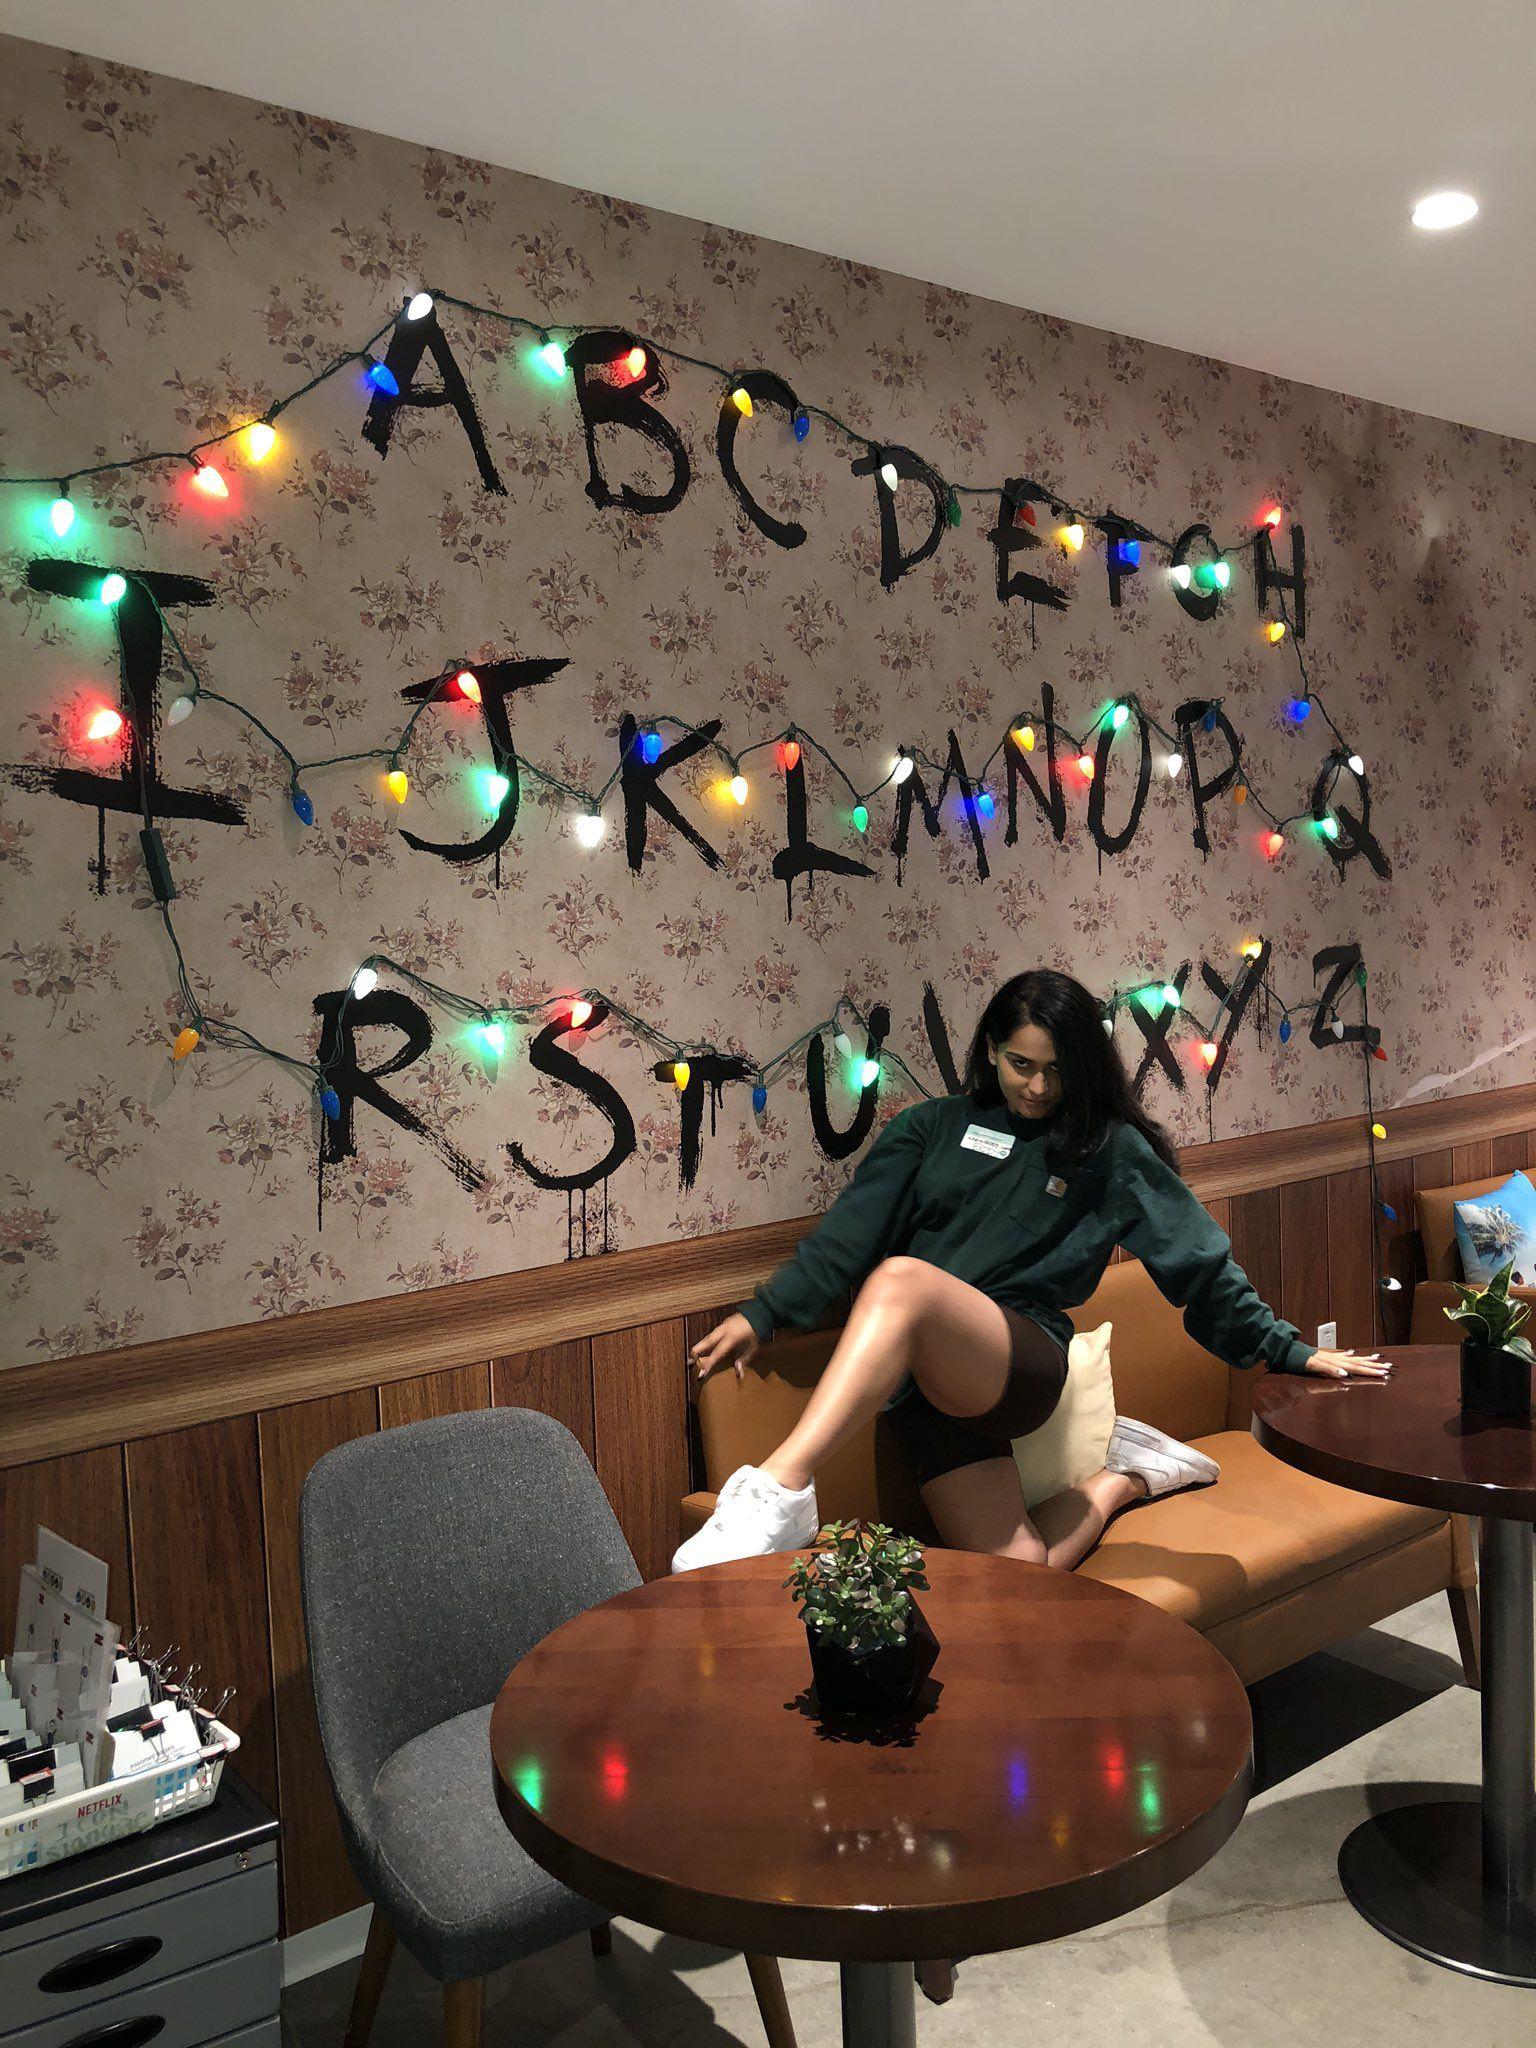 Pinterest spiciwasabi 🦋🦋🦋 Halloween Decorations